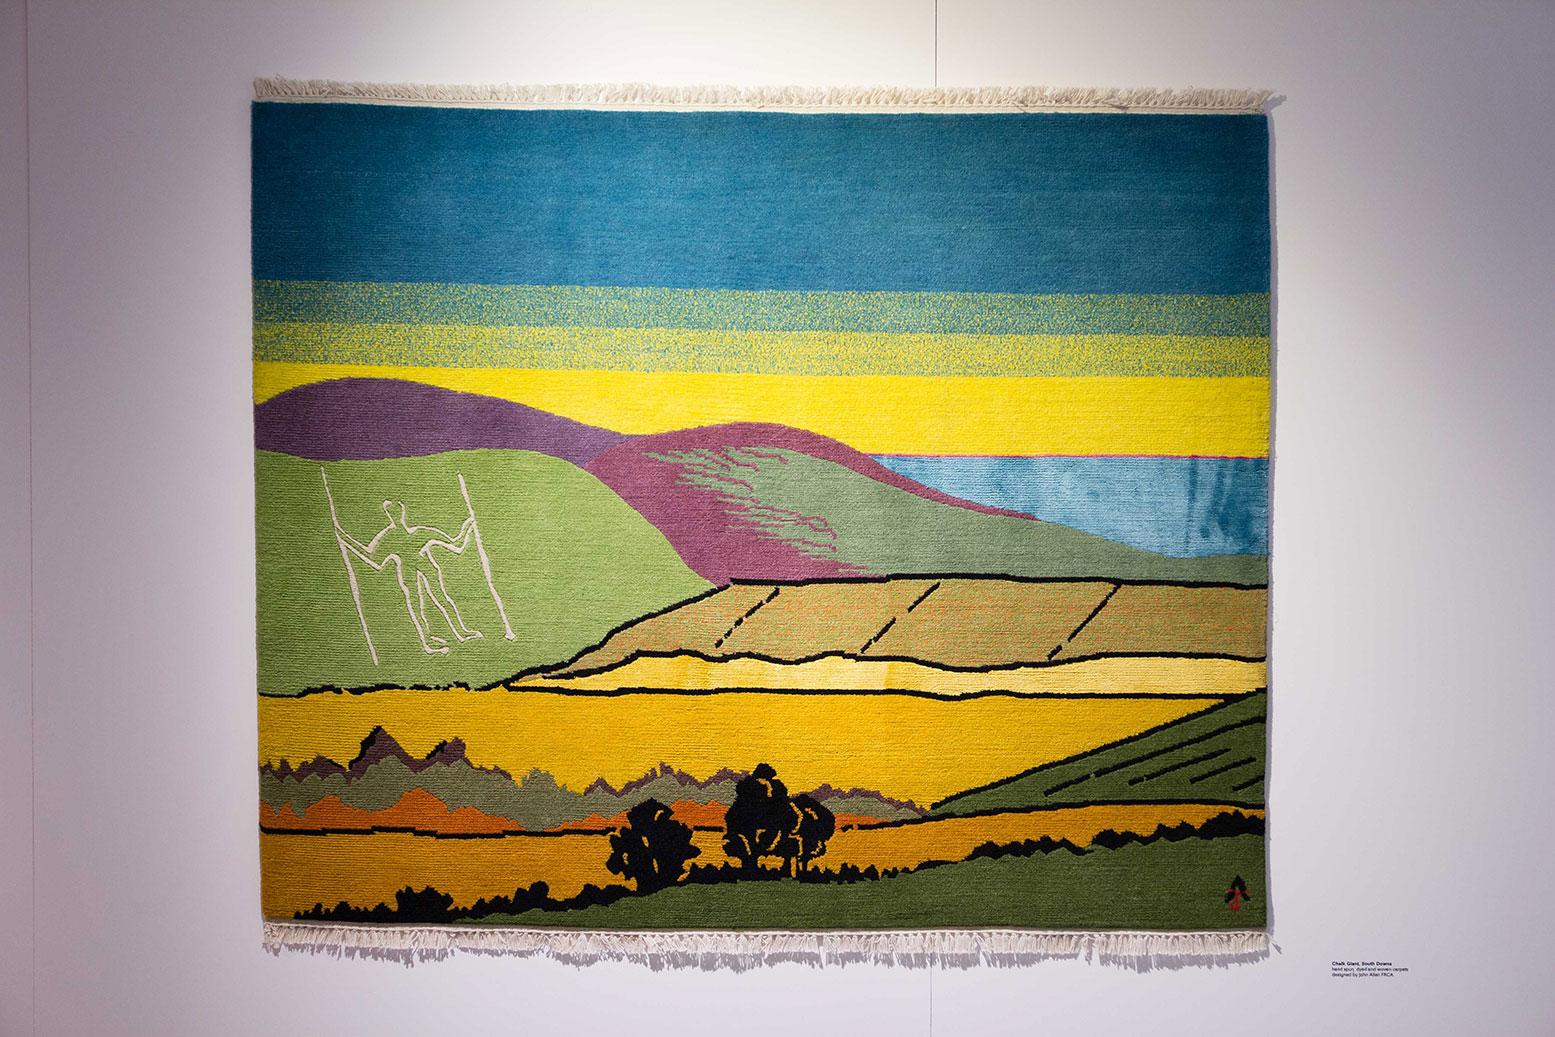 "'Chalk Giants', South Downs. De una serie de tapices edición limitada tejidos y teñidos a mano, con paisajes británicos diseñados por John Allen FRCA"""